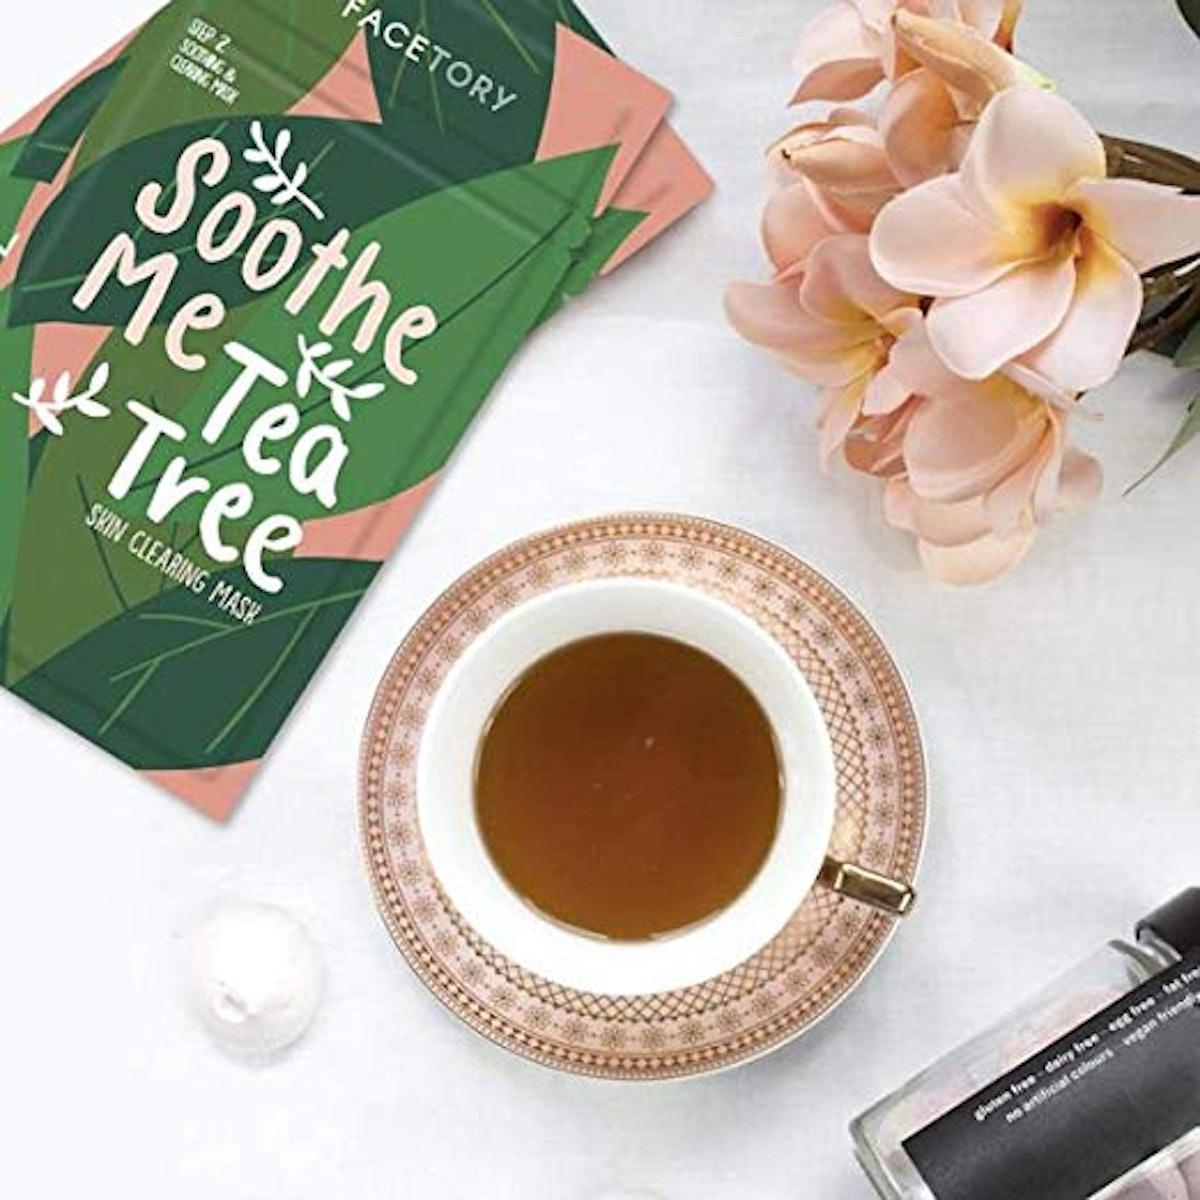 FaceTory Soothe Me Tea Tree Sheet Mask (10-Pack)